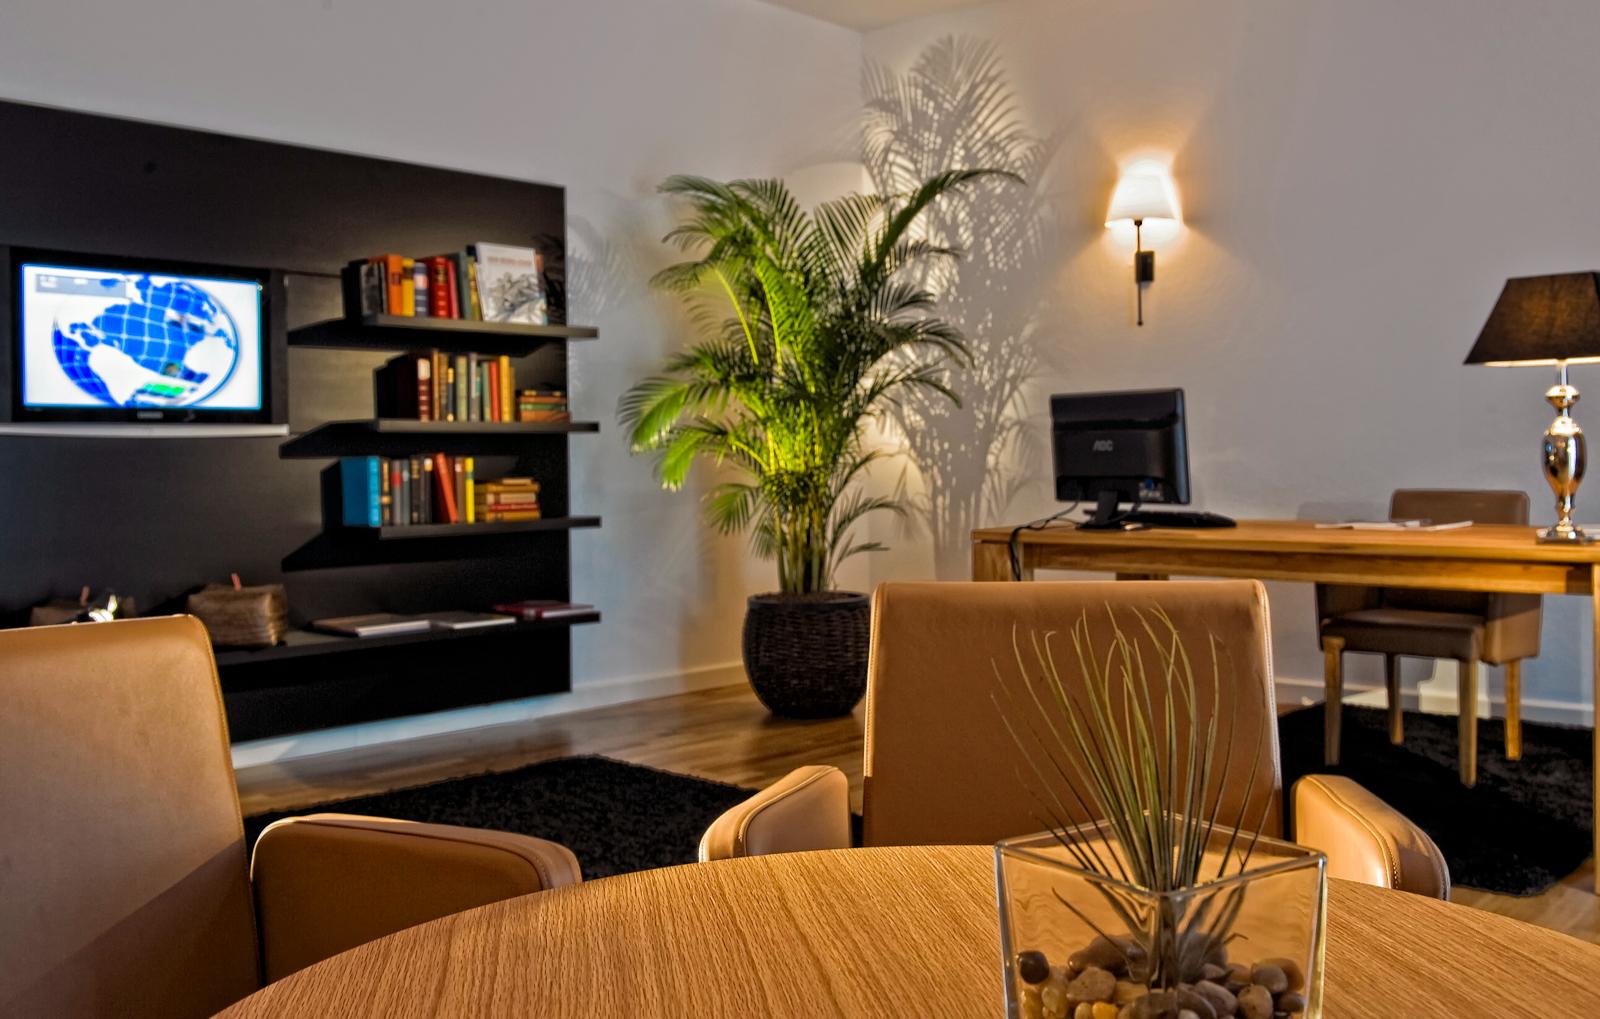 thermen-spa-hotels-rosenheim-bg41626082896